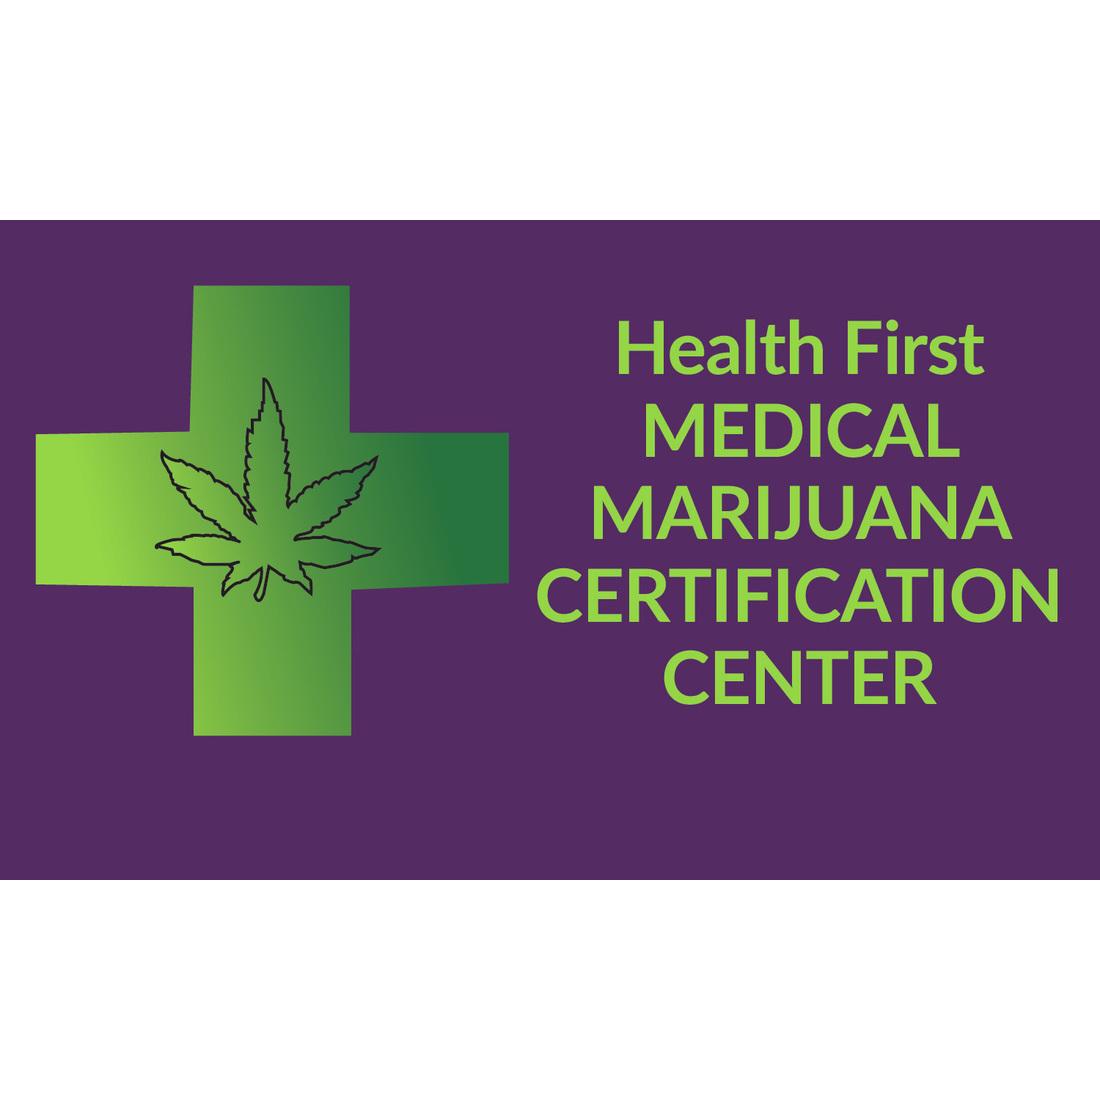 Health First Medical Marijuana Certification Center